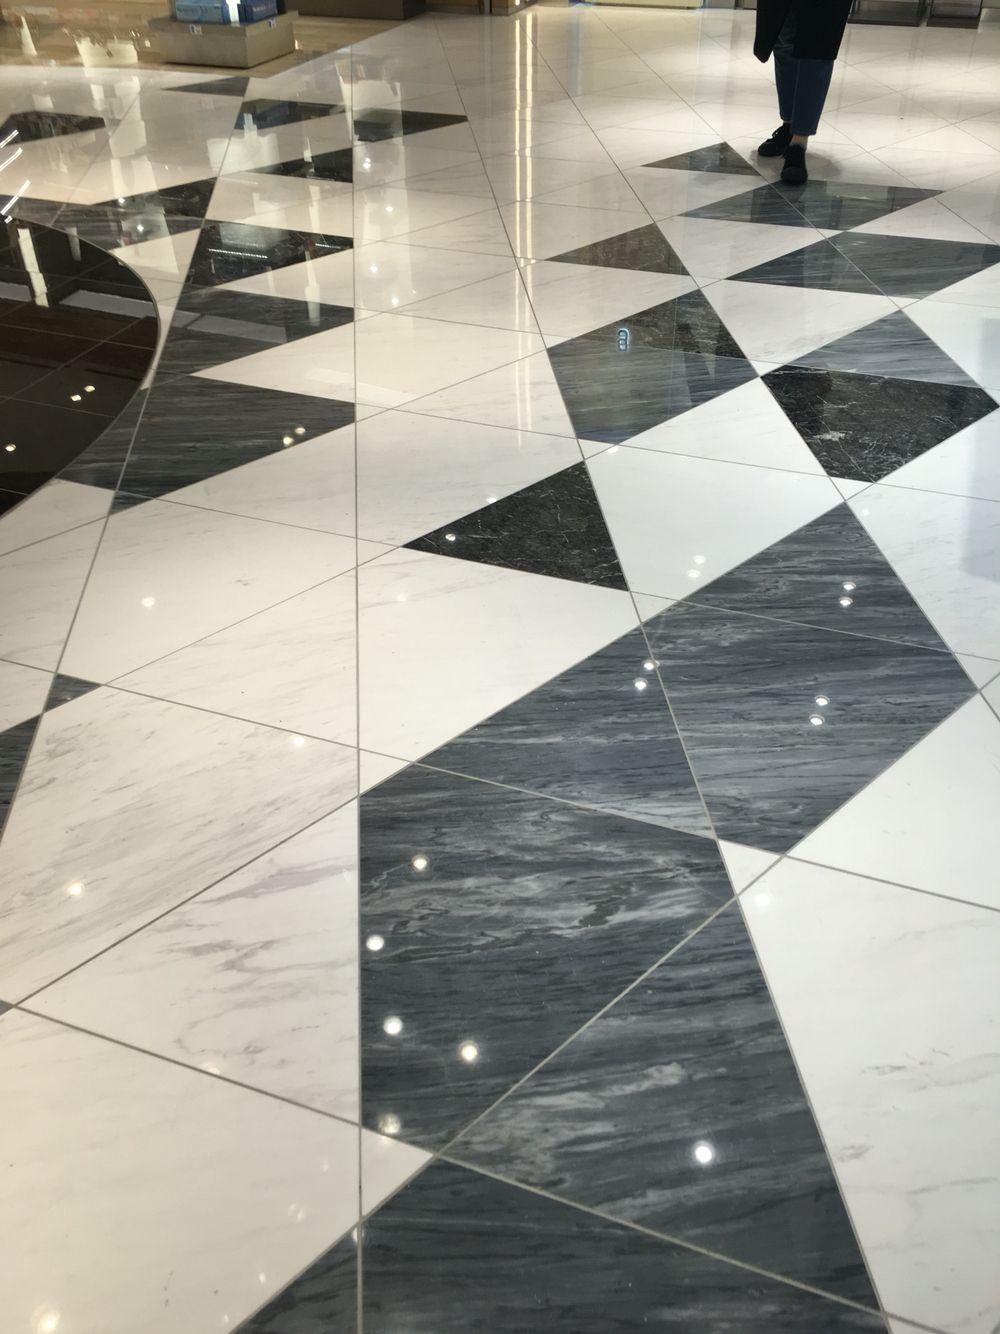 Floor Tile Designs Ideas To Enhance Your Floor Appearance: Tokyo Ginza Tokyu Plaza